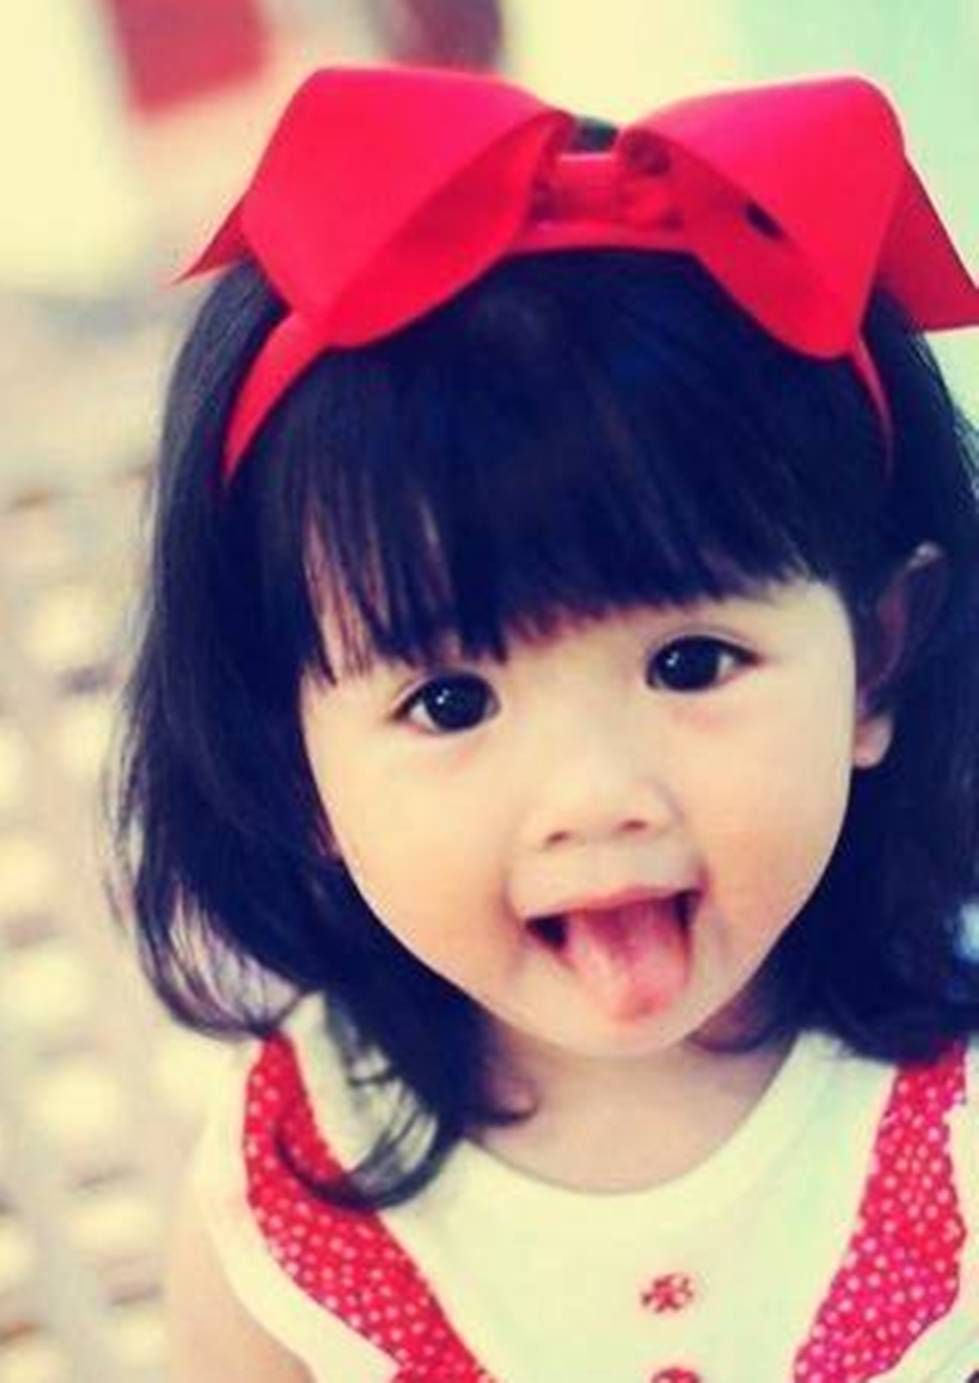 Cute asian girl frisuren beauty pinterest baby fever